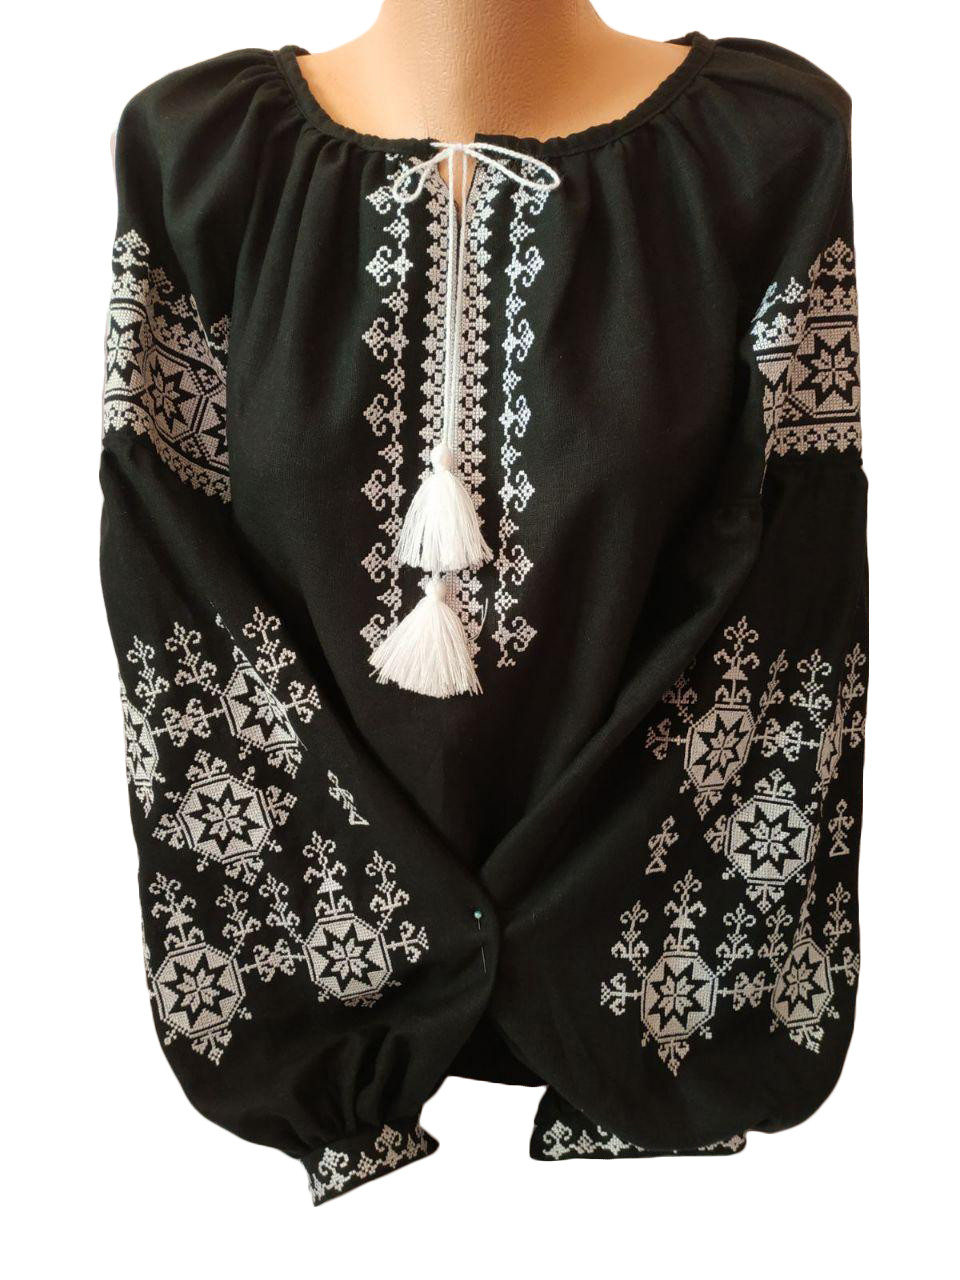 "Жіноча вишита сорочка (блузка) ""Бонні"" (Женская вышитая рубашка (блузка) ""Бонні"") BT-0022"